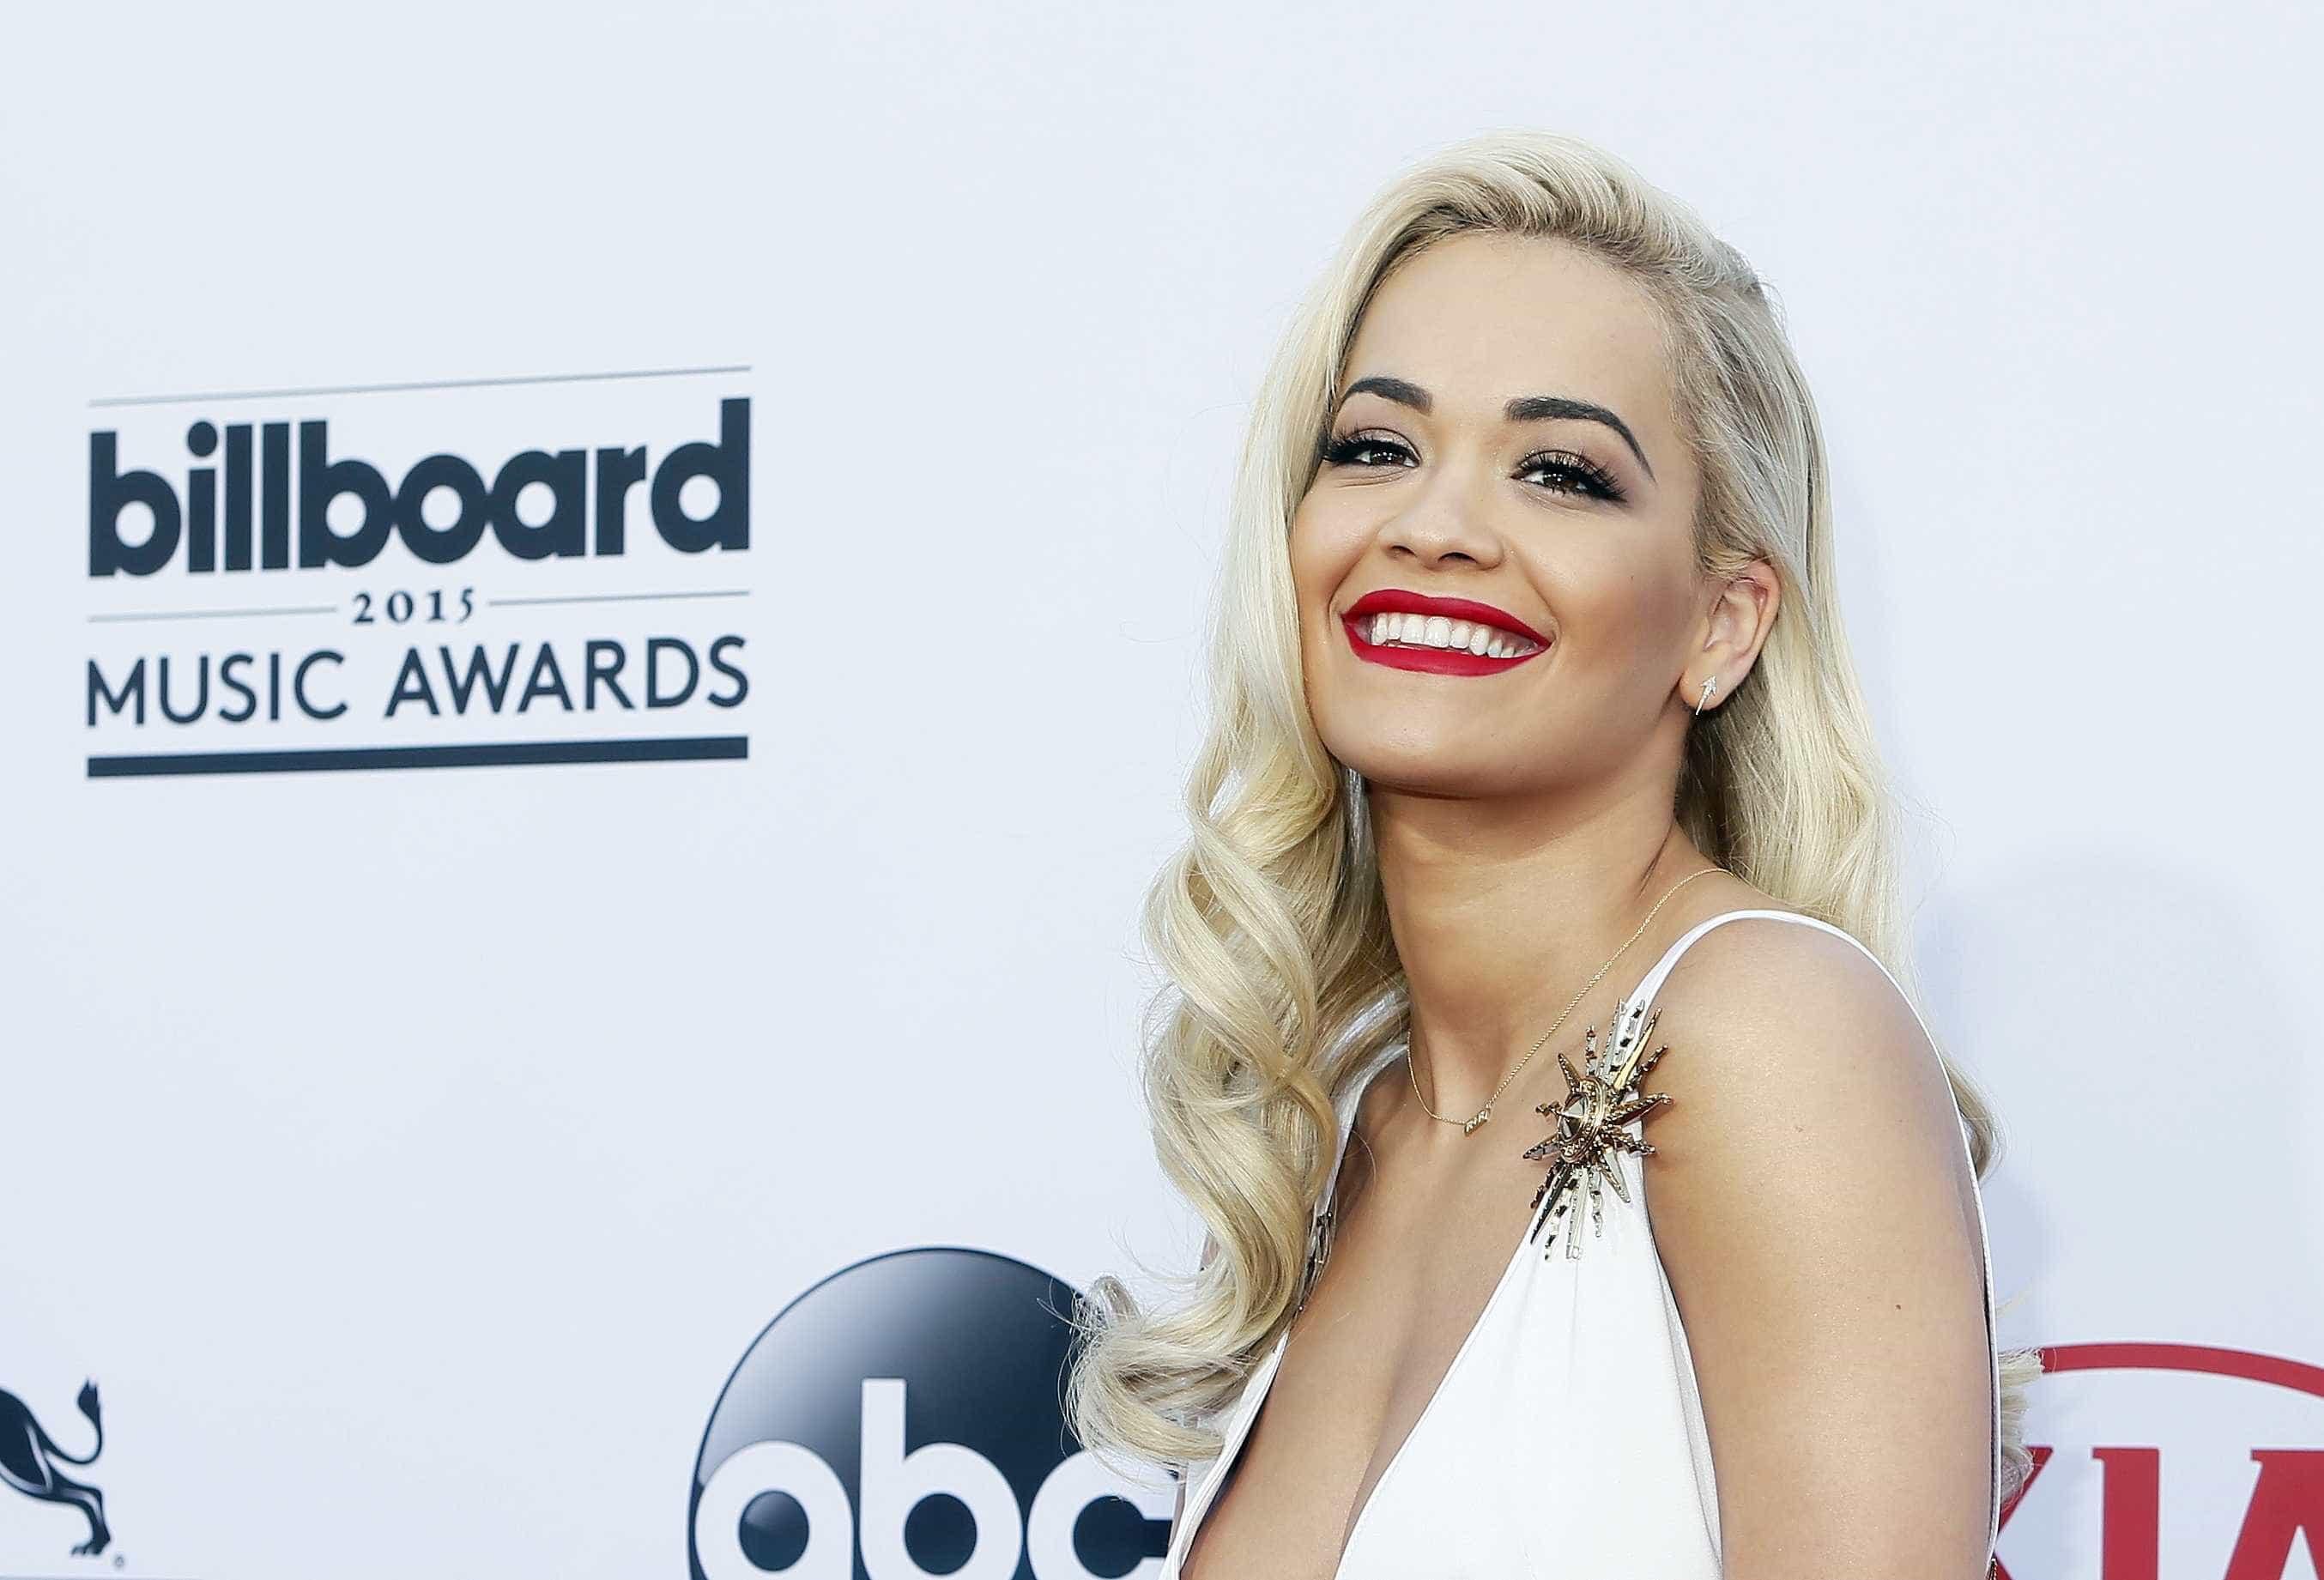 Rita Ora estará a namorar com estrela de reality shows